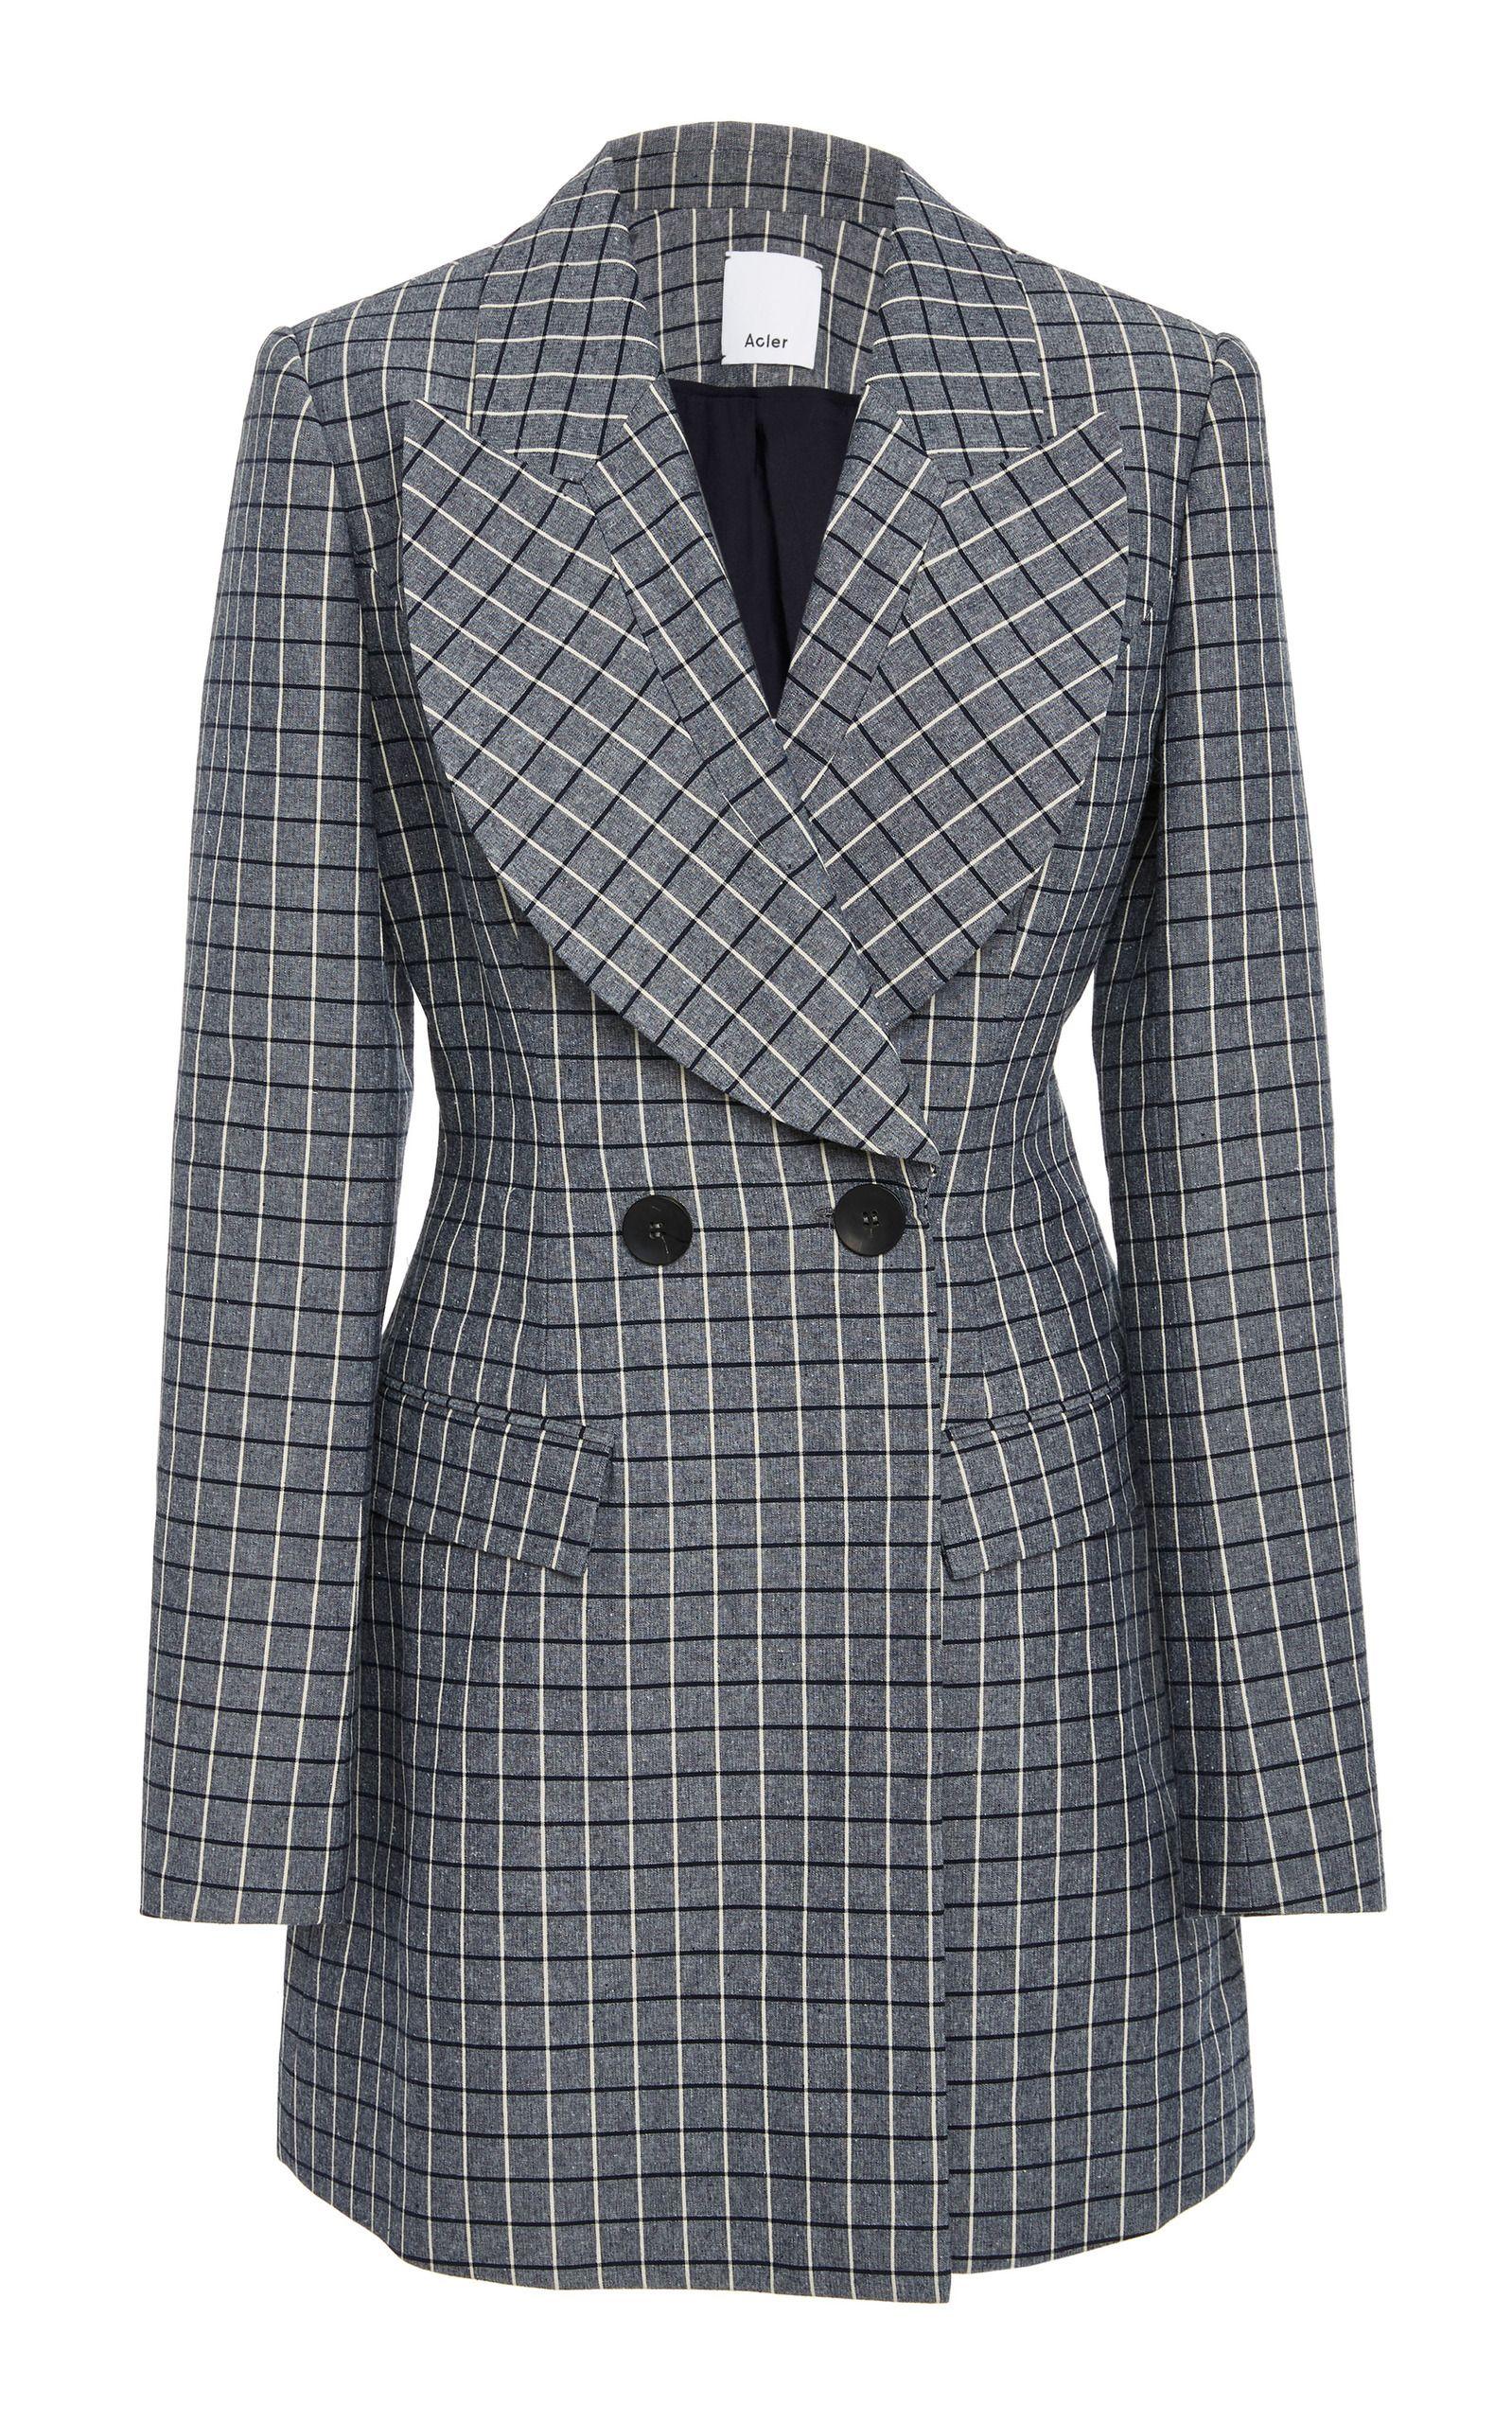 Acler Cunningham double breasted blazer Original Cheap Price 3AdjvSB8